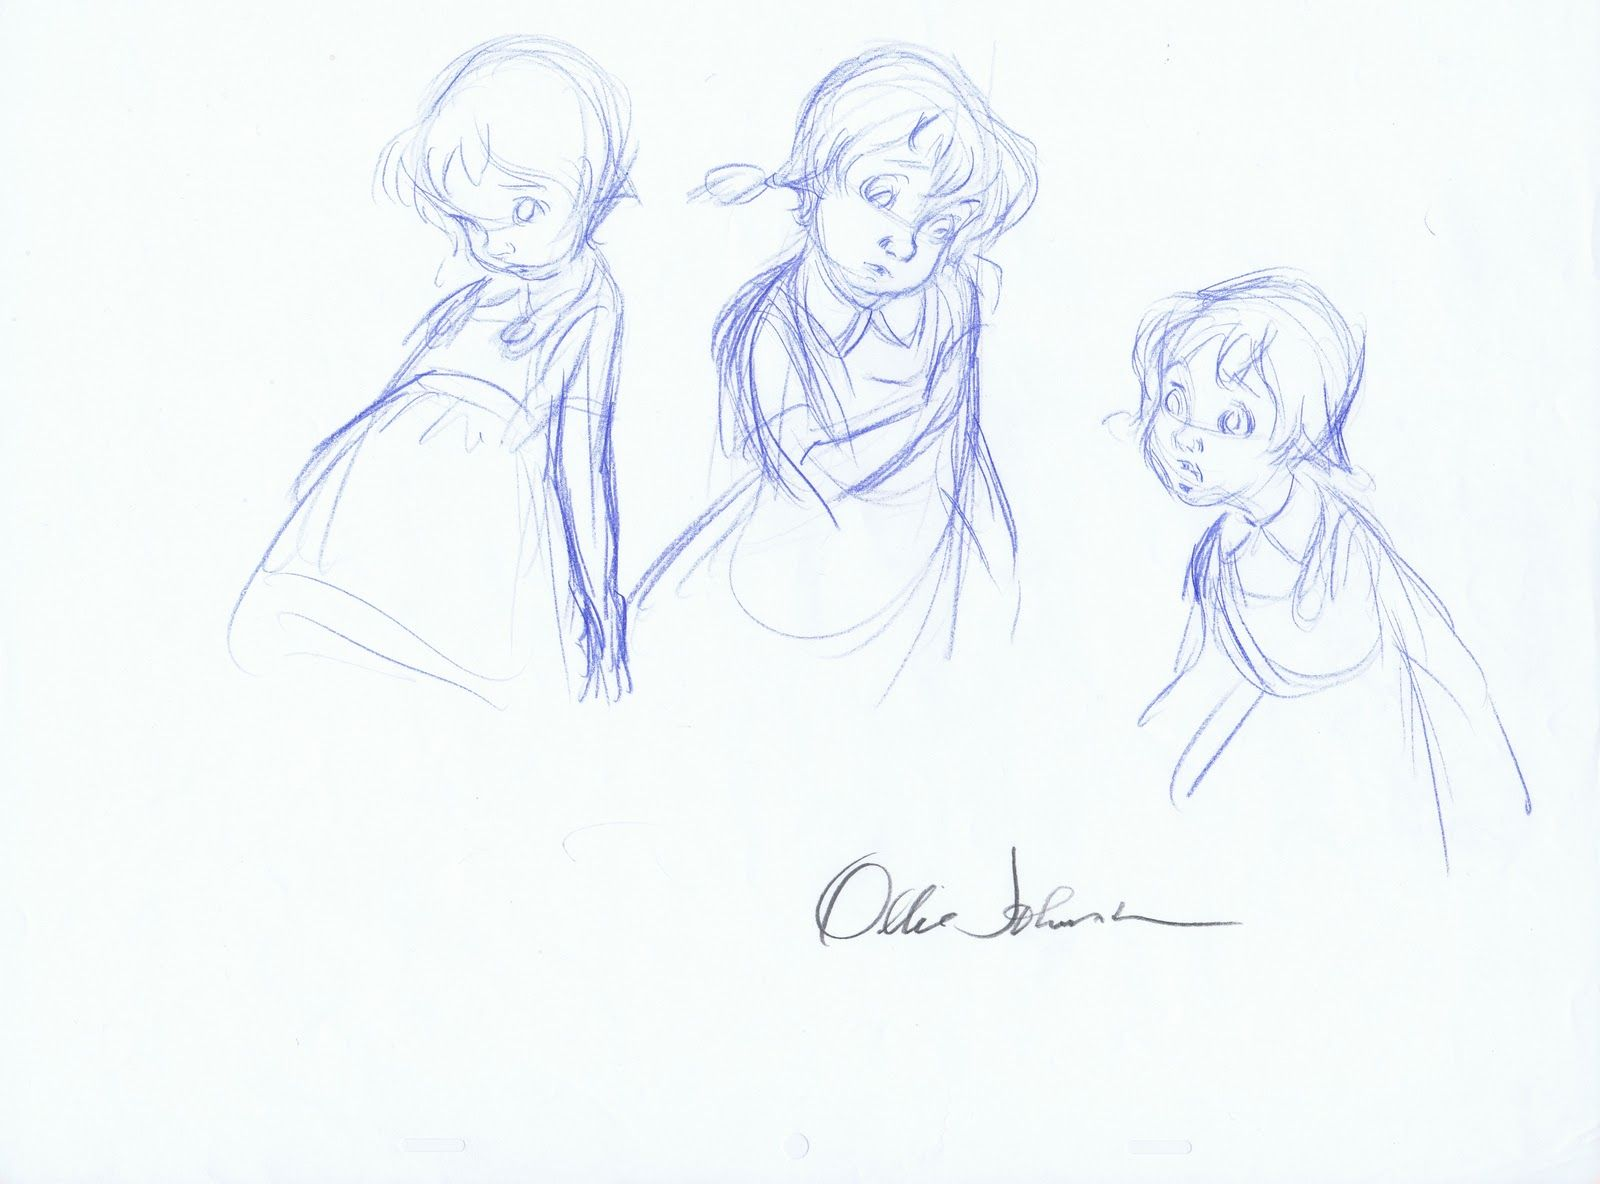 Ollie johnston sketch